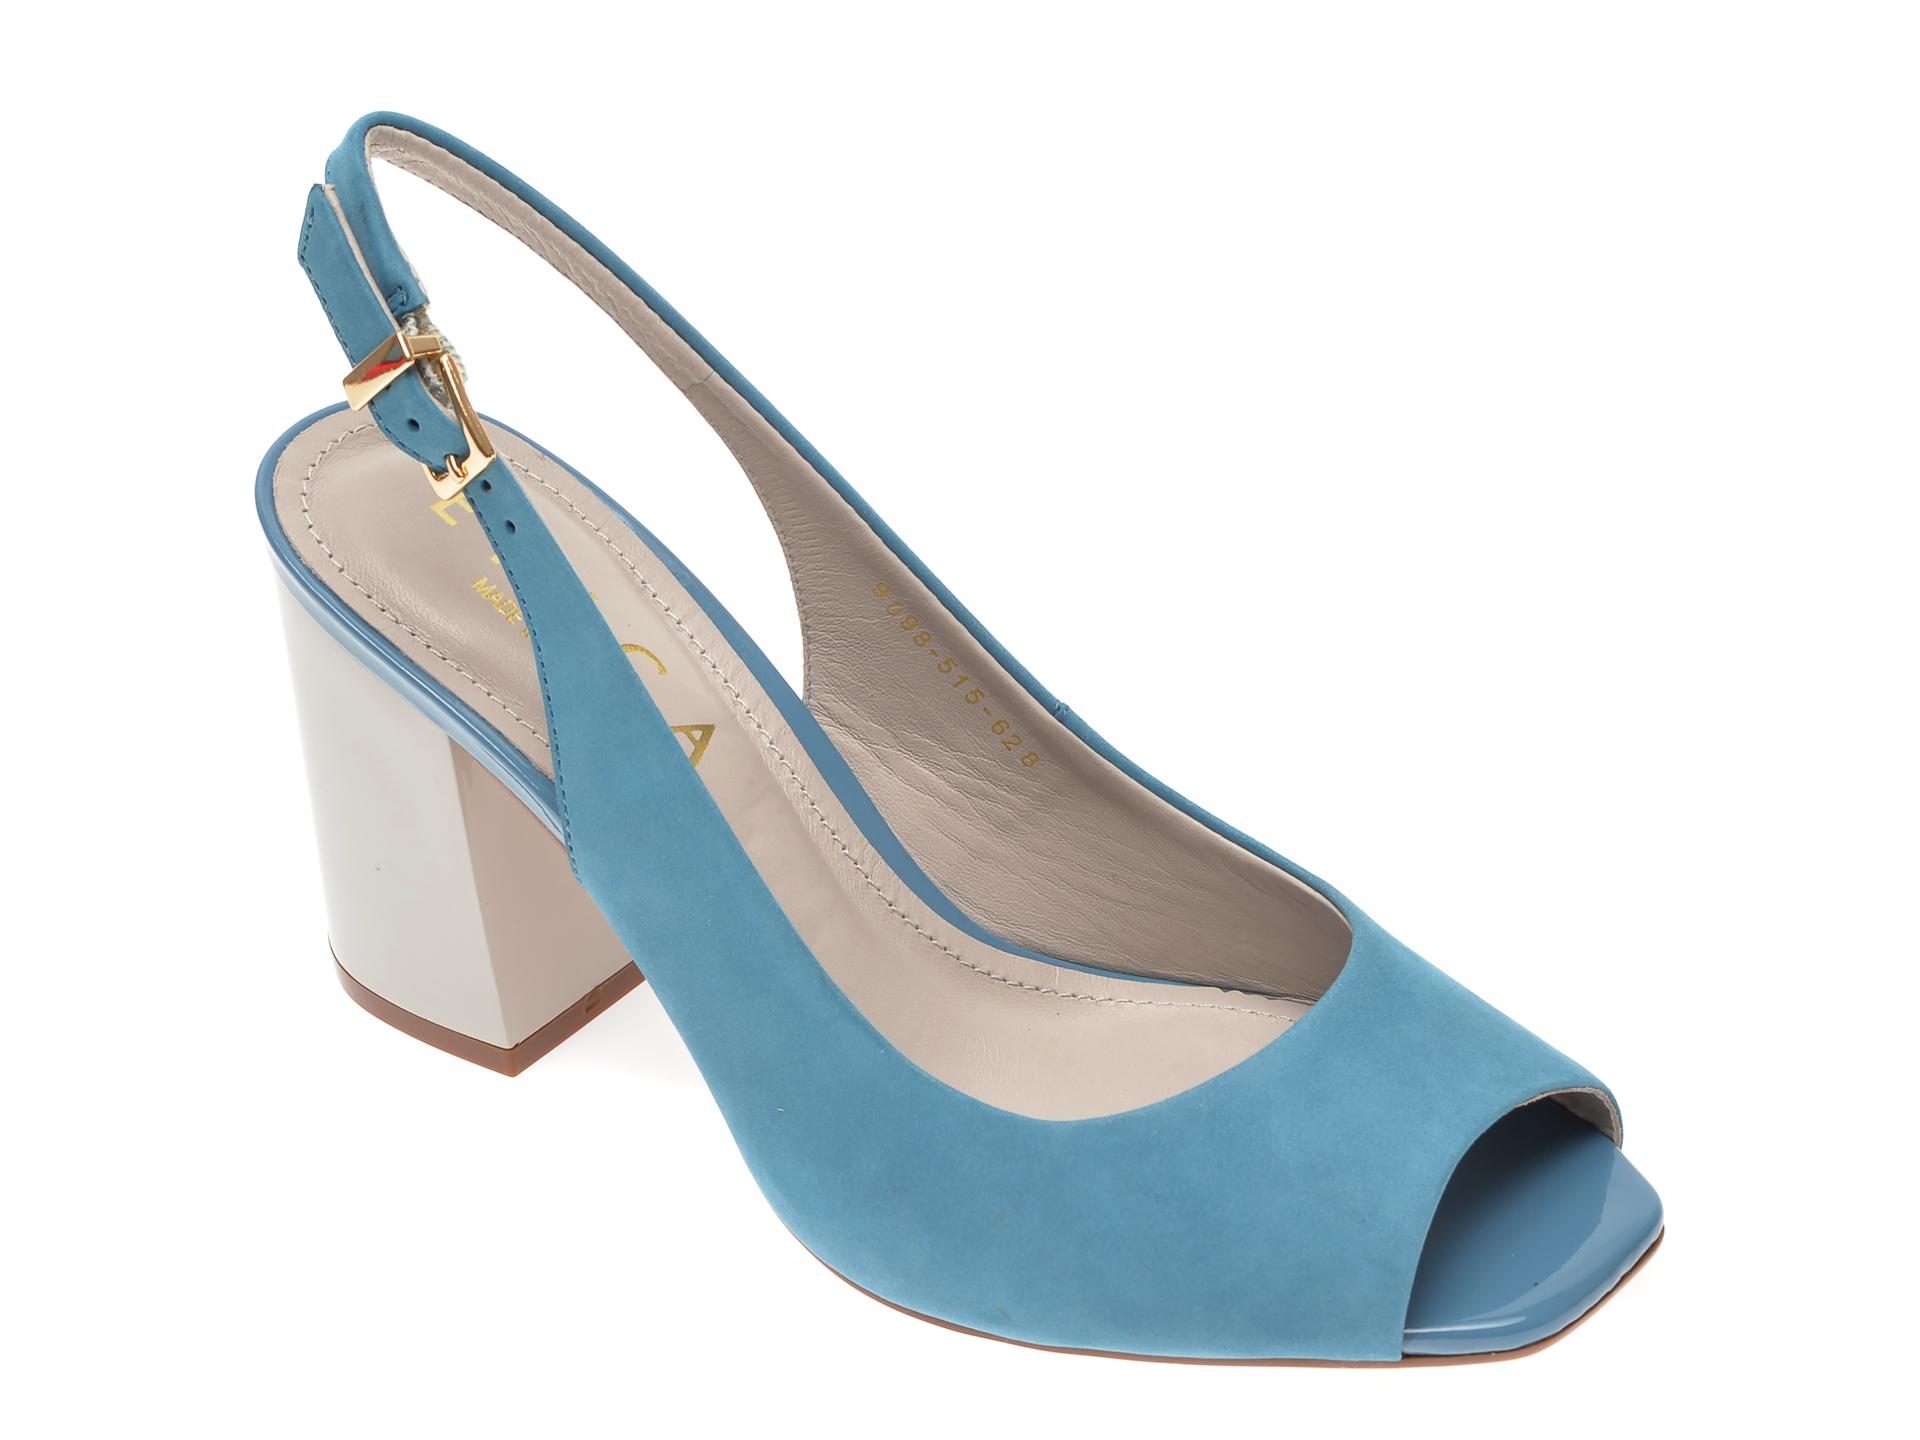 Sandale EPICA albastre, 9098515, din nabuc